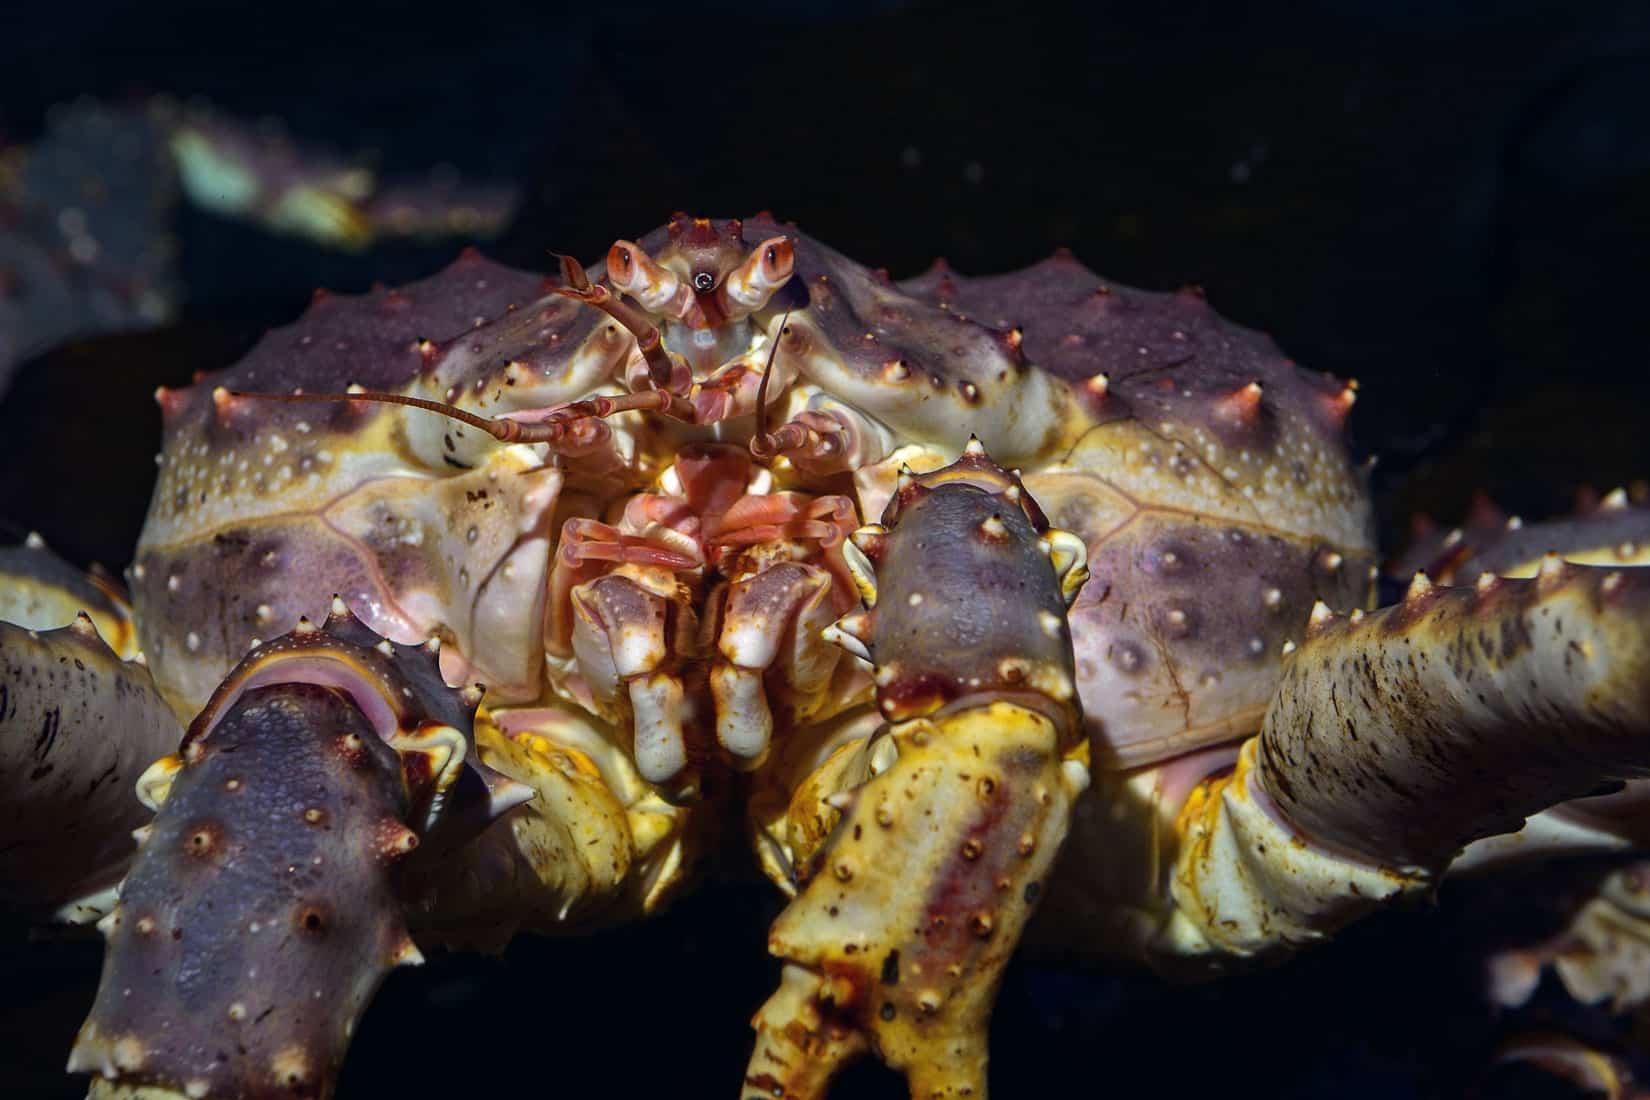 Le crabe royal du Kamtchatcka - Paralithodes camtschaticus